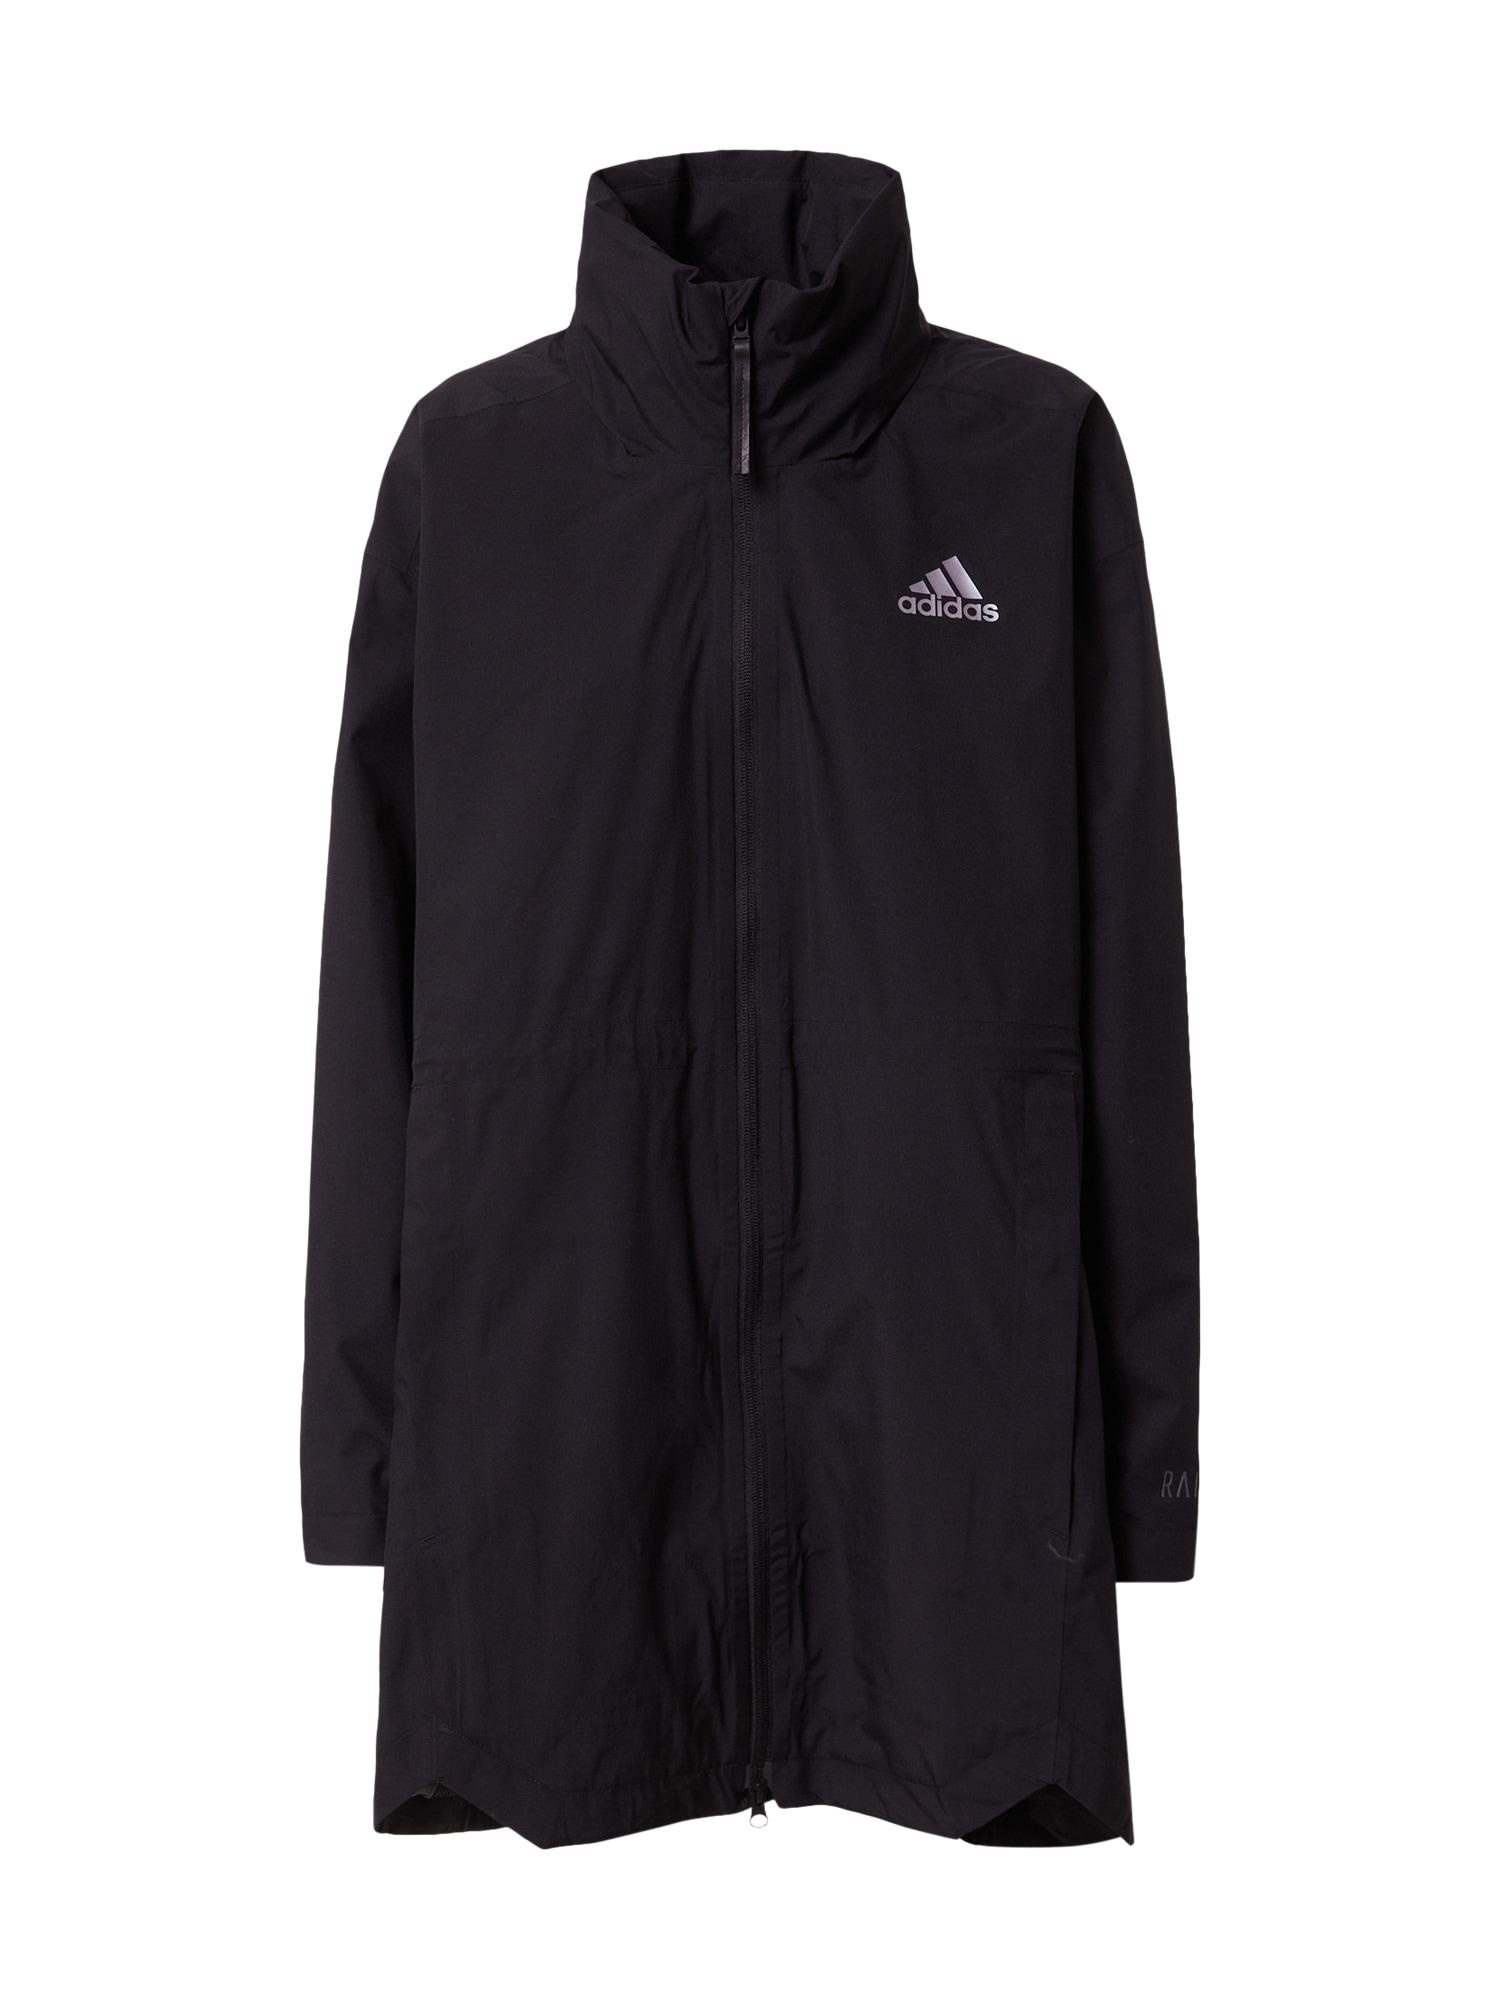 ADIDAS PERFORMANCE Outdoorová bunda 'Traveer'  černá / bílá